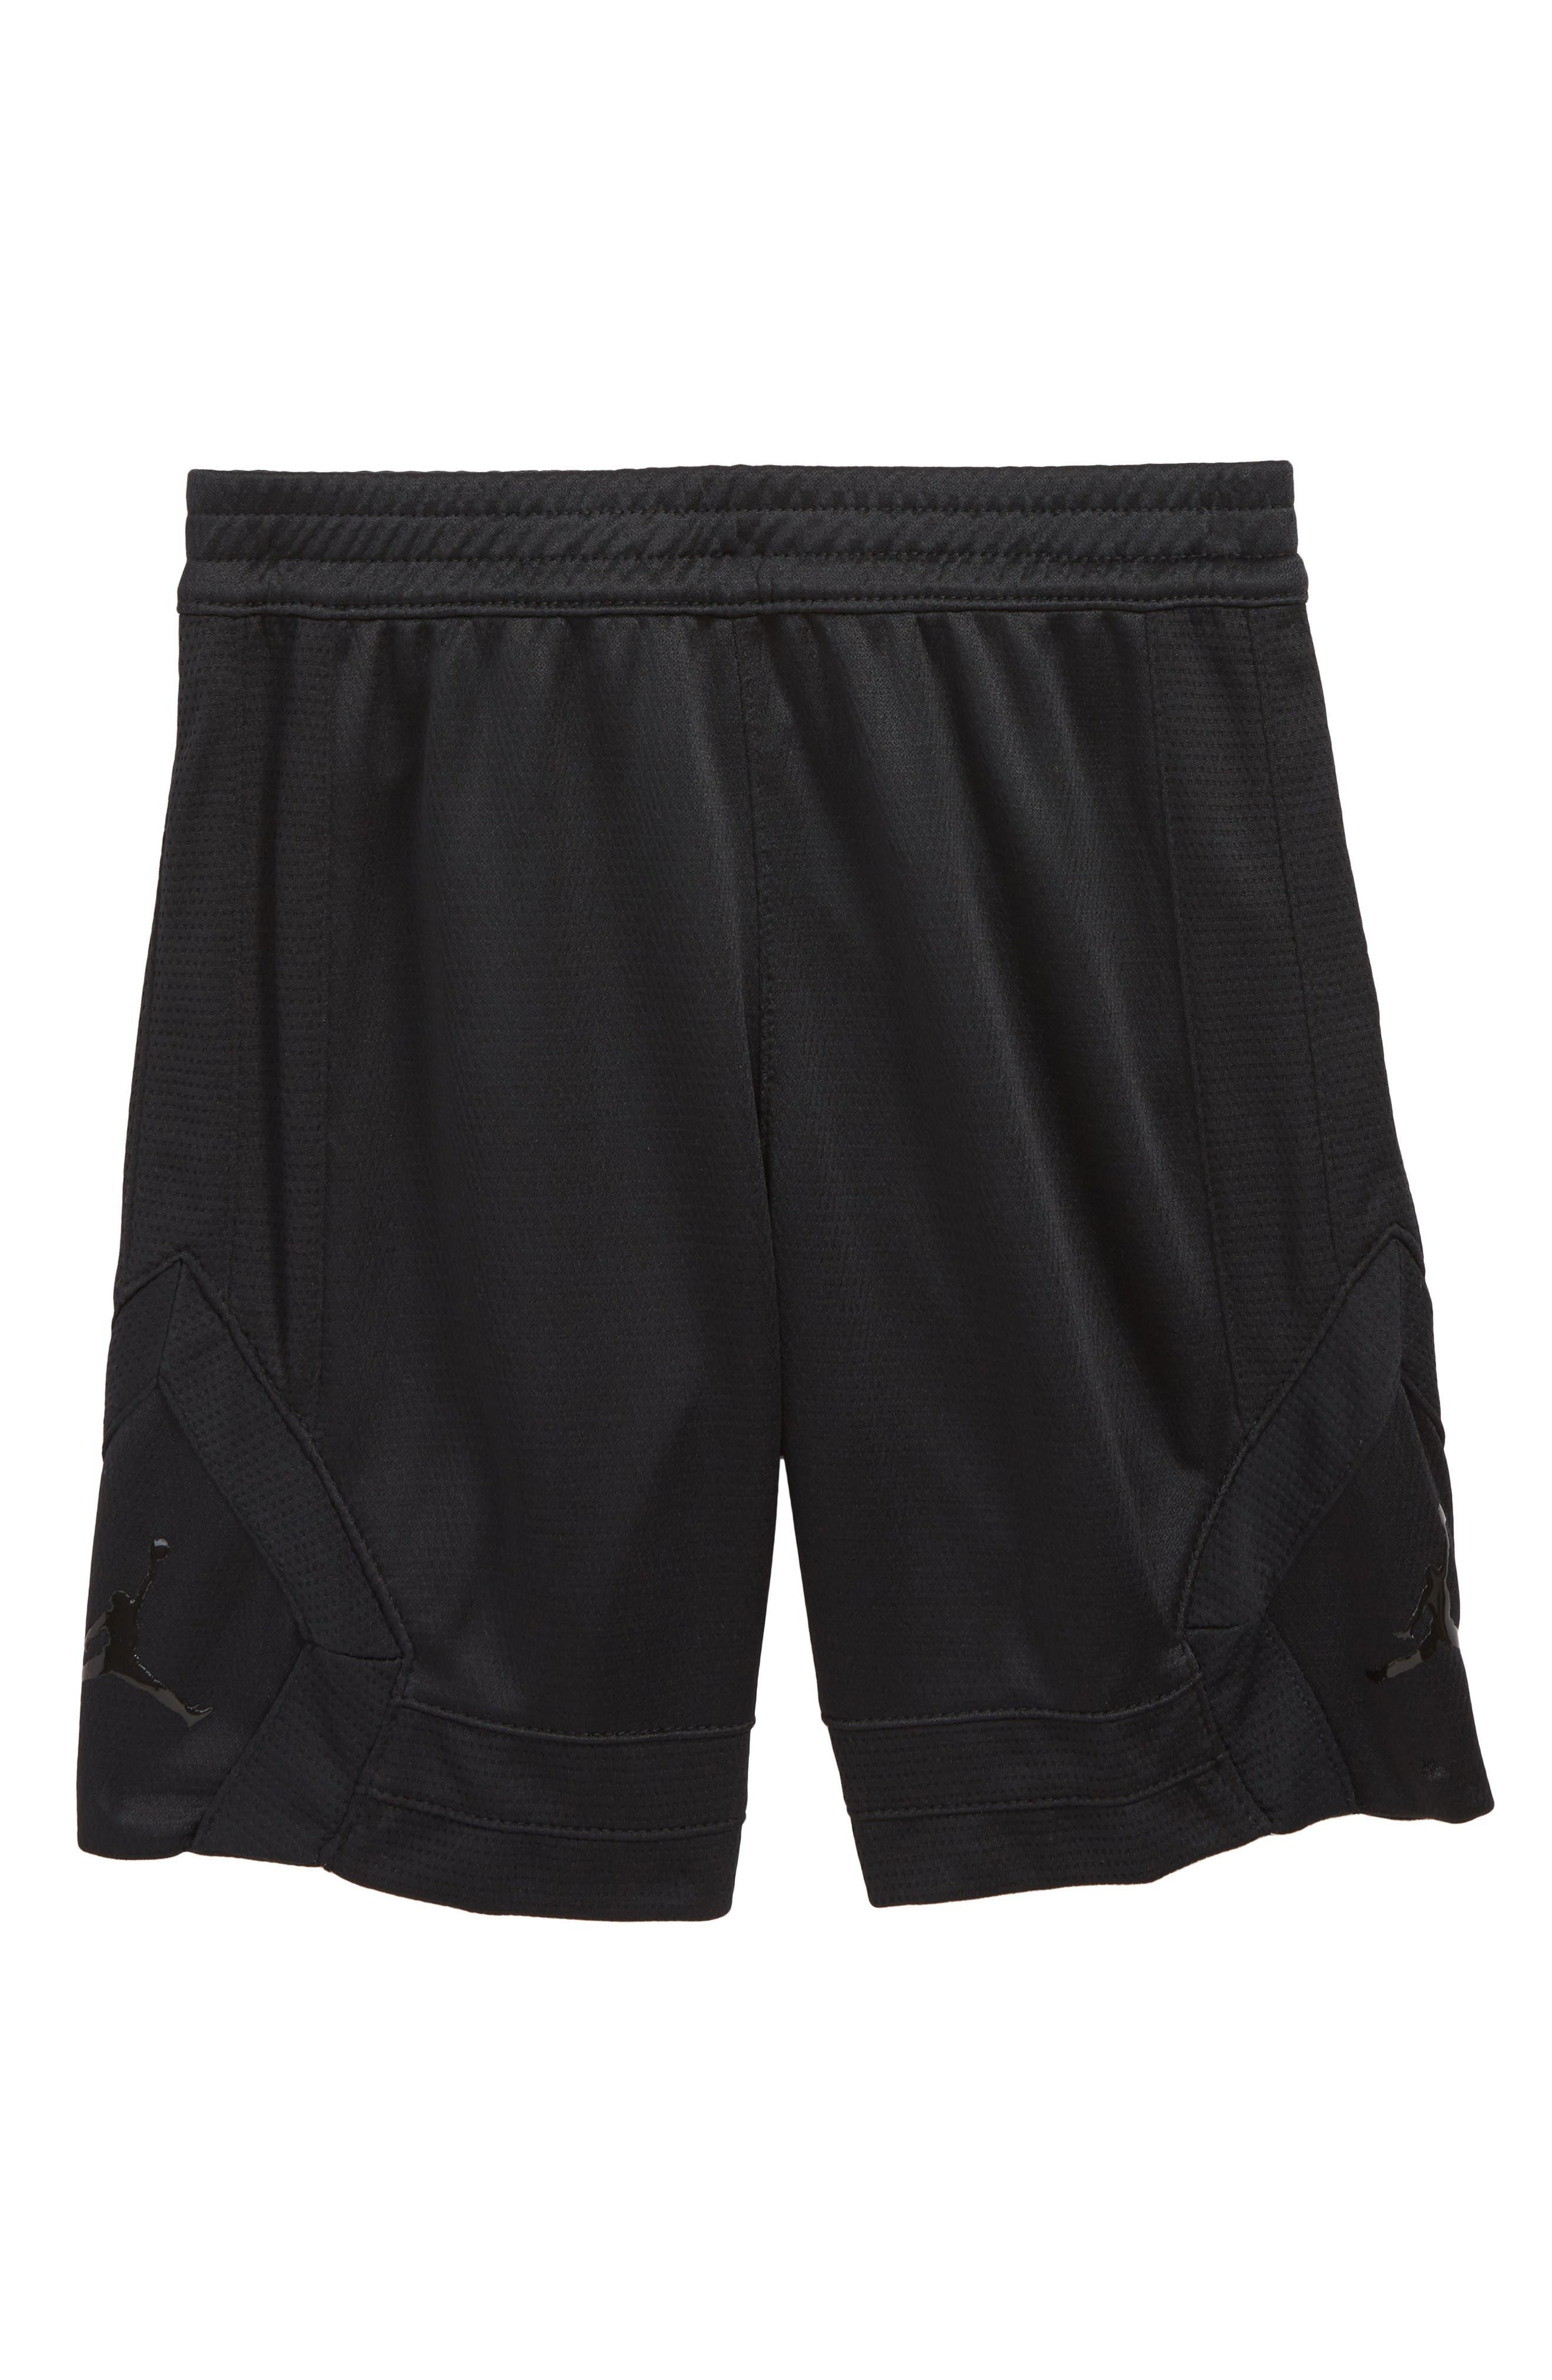 Jordan Rise Basketball Shorts,                             Main thumbnail 1, color,                             BLACK